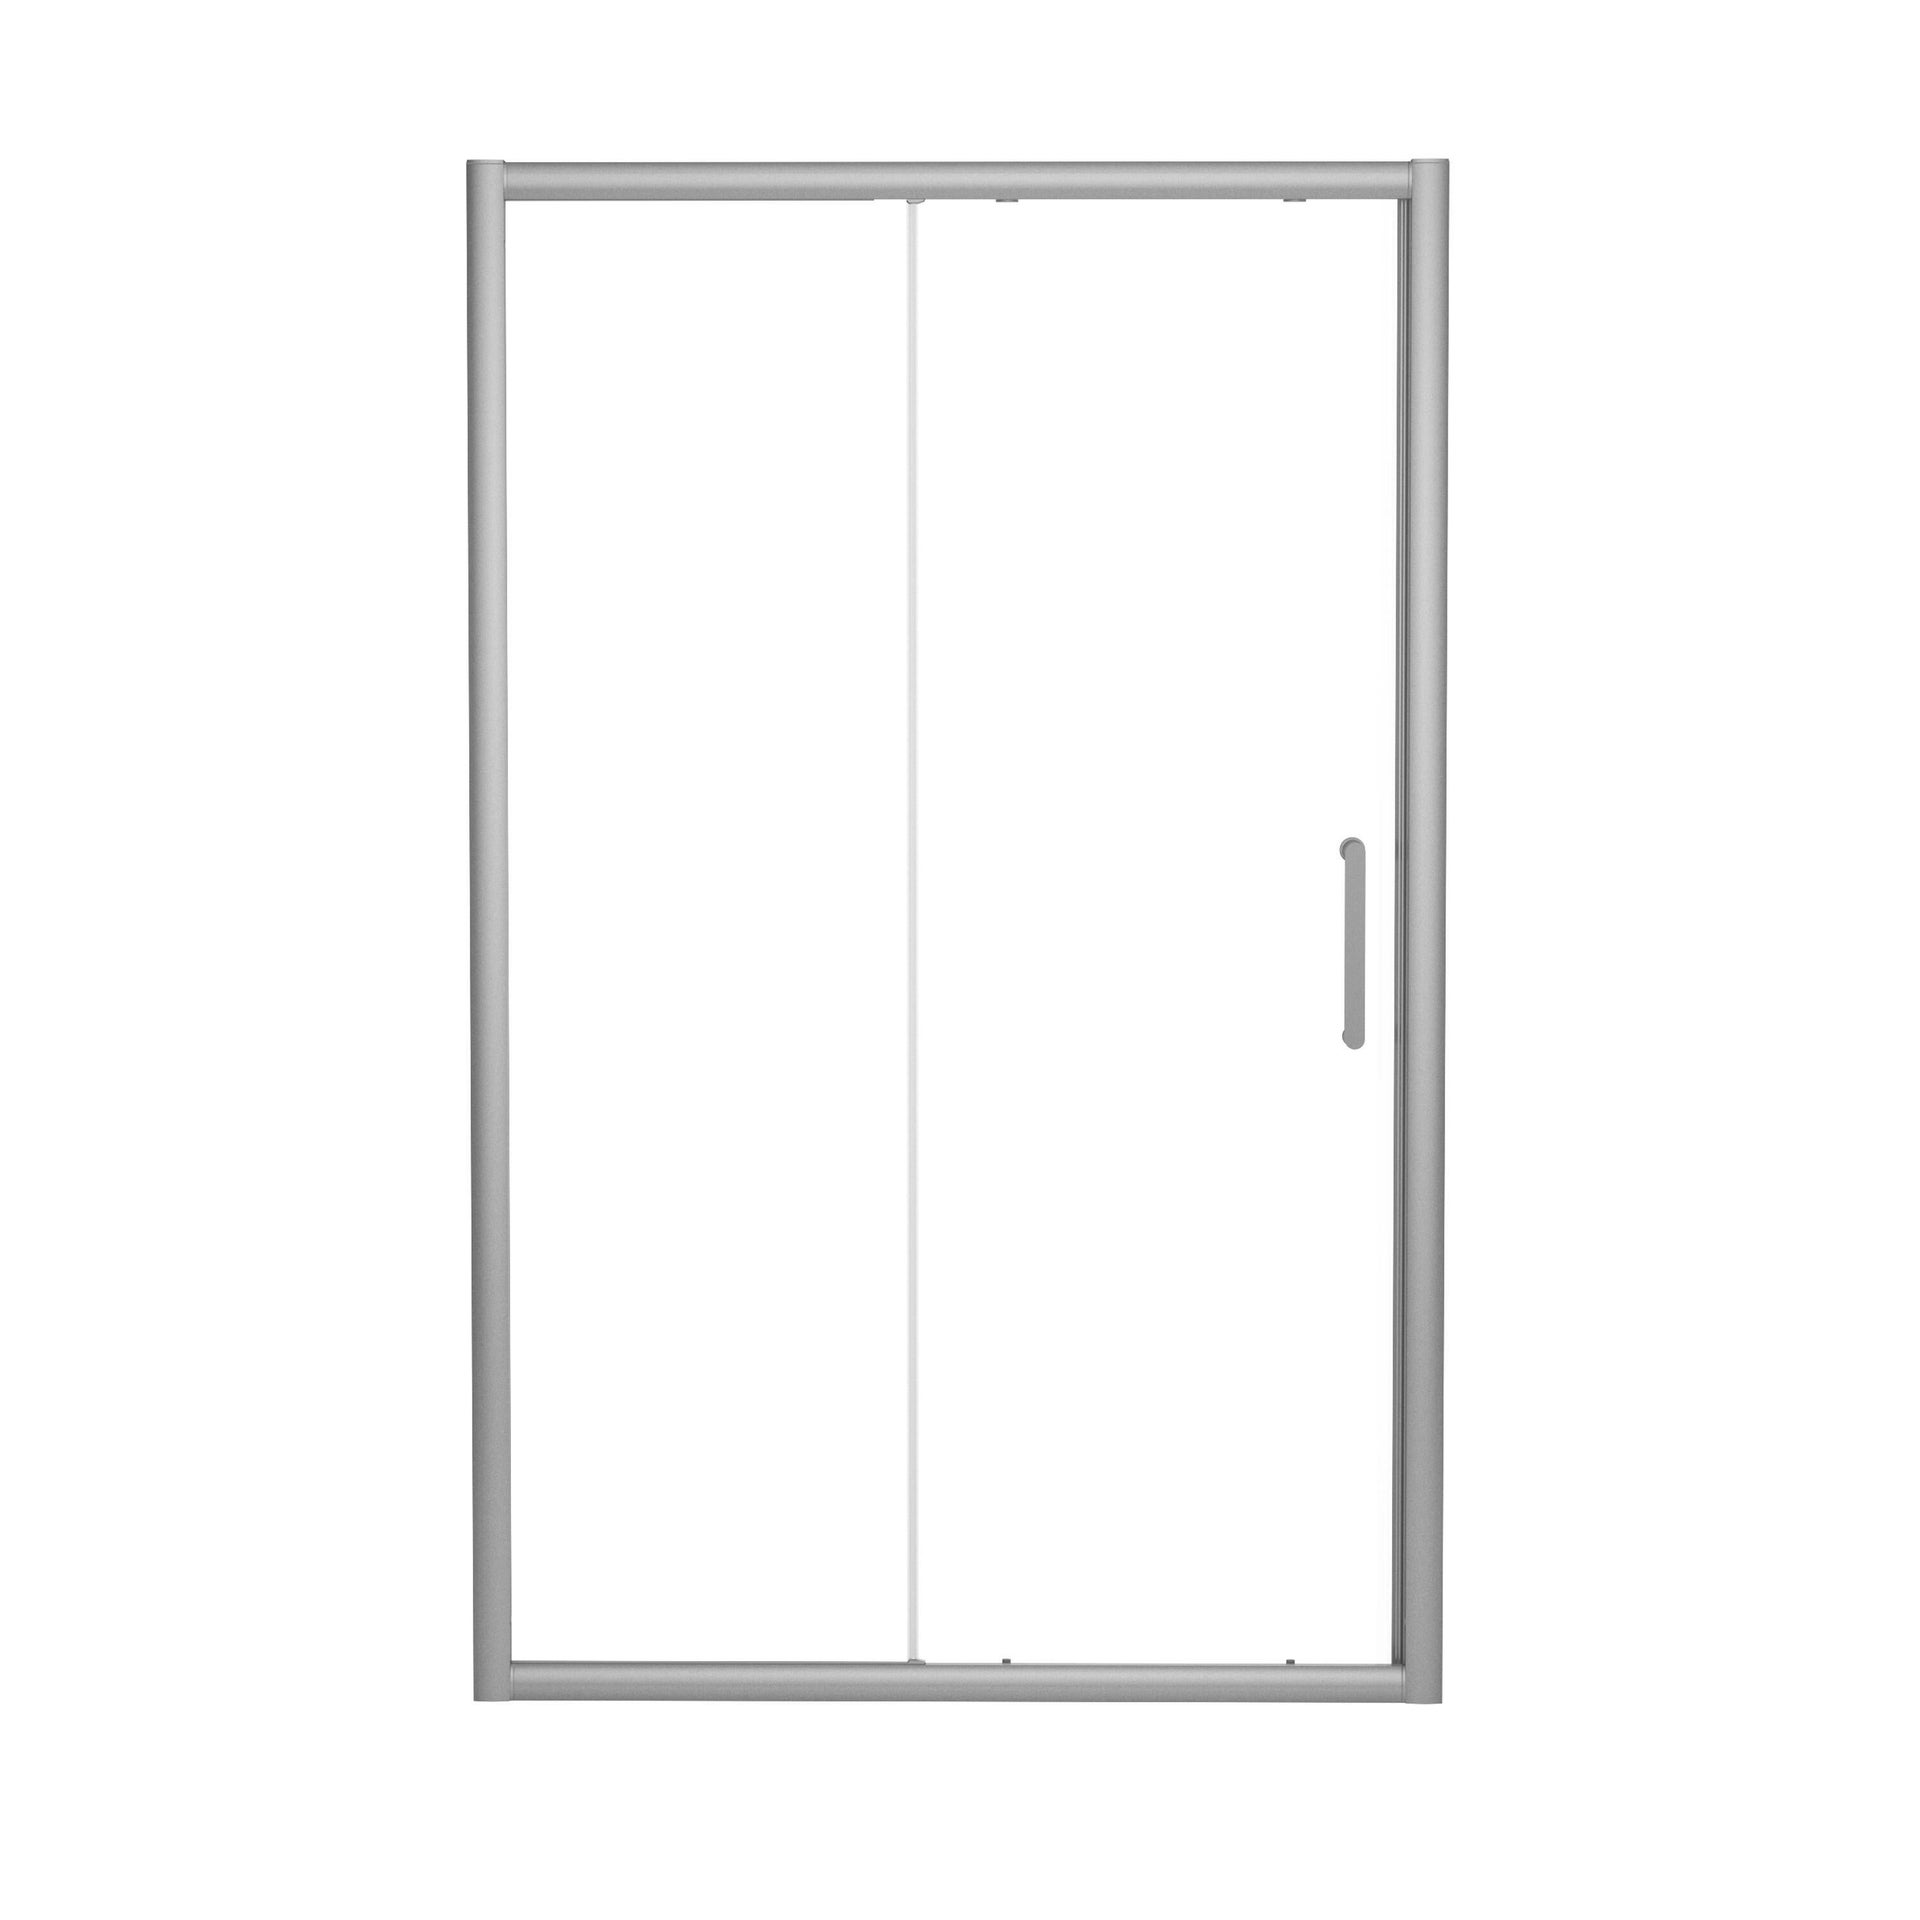 Porta doccia scorrevole Quad 100 cm, H 190 cm in vetro, spessore 6 mm trasparente satinato - 3